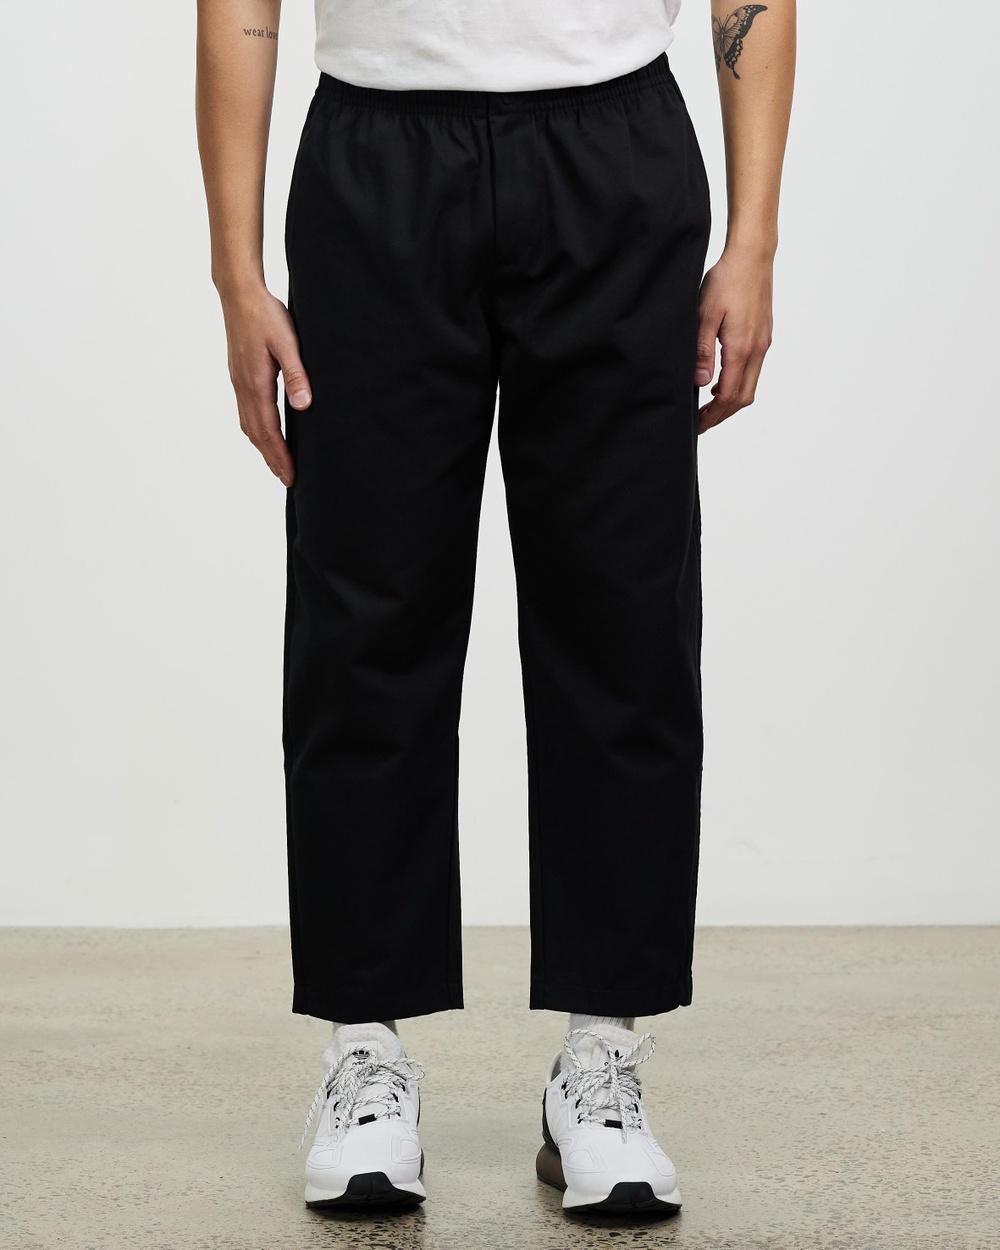 adidas Originals Adicolor Trefoil Relaxed Twill Pants Black